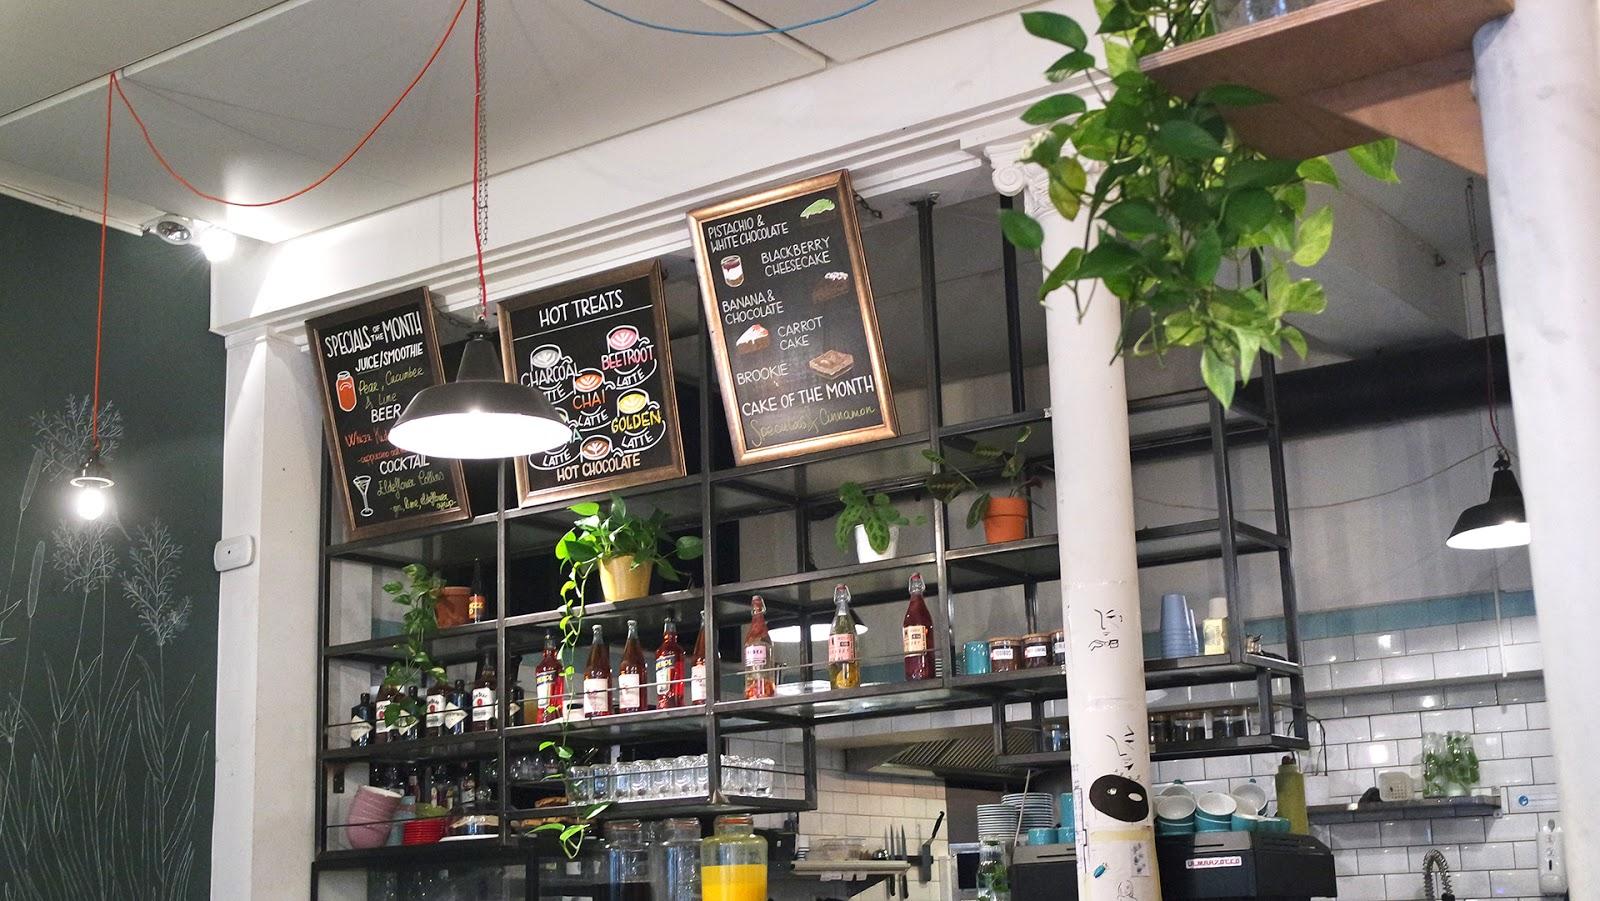 Inside Peck 47 café